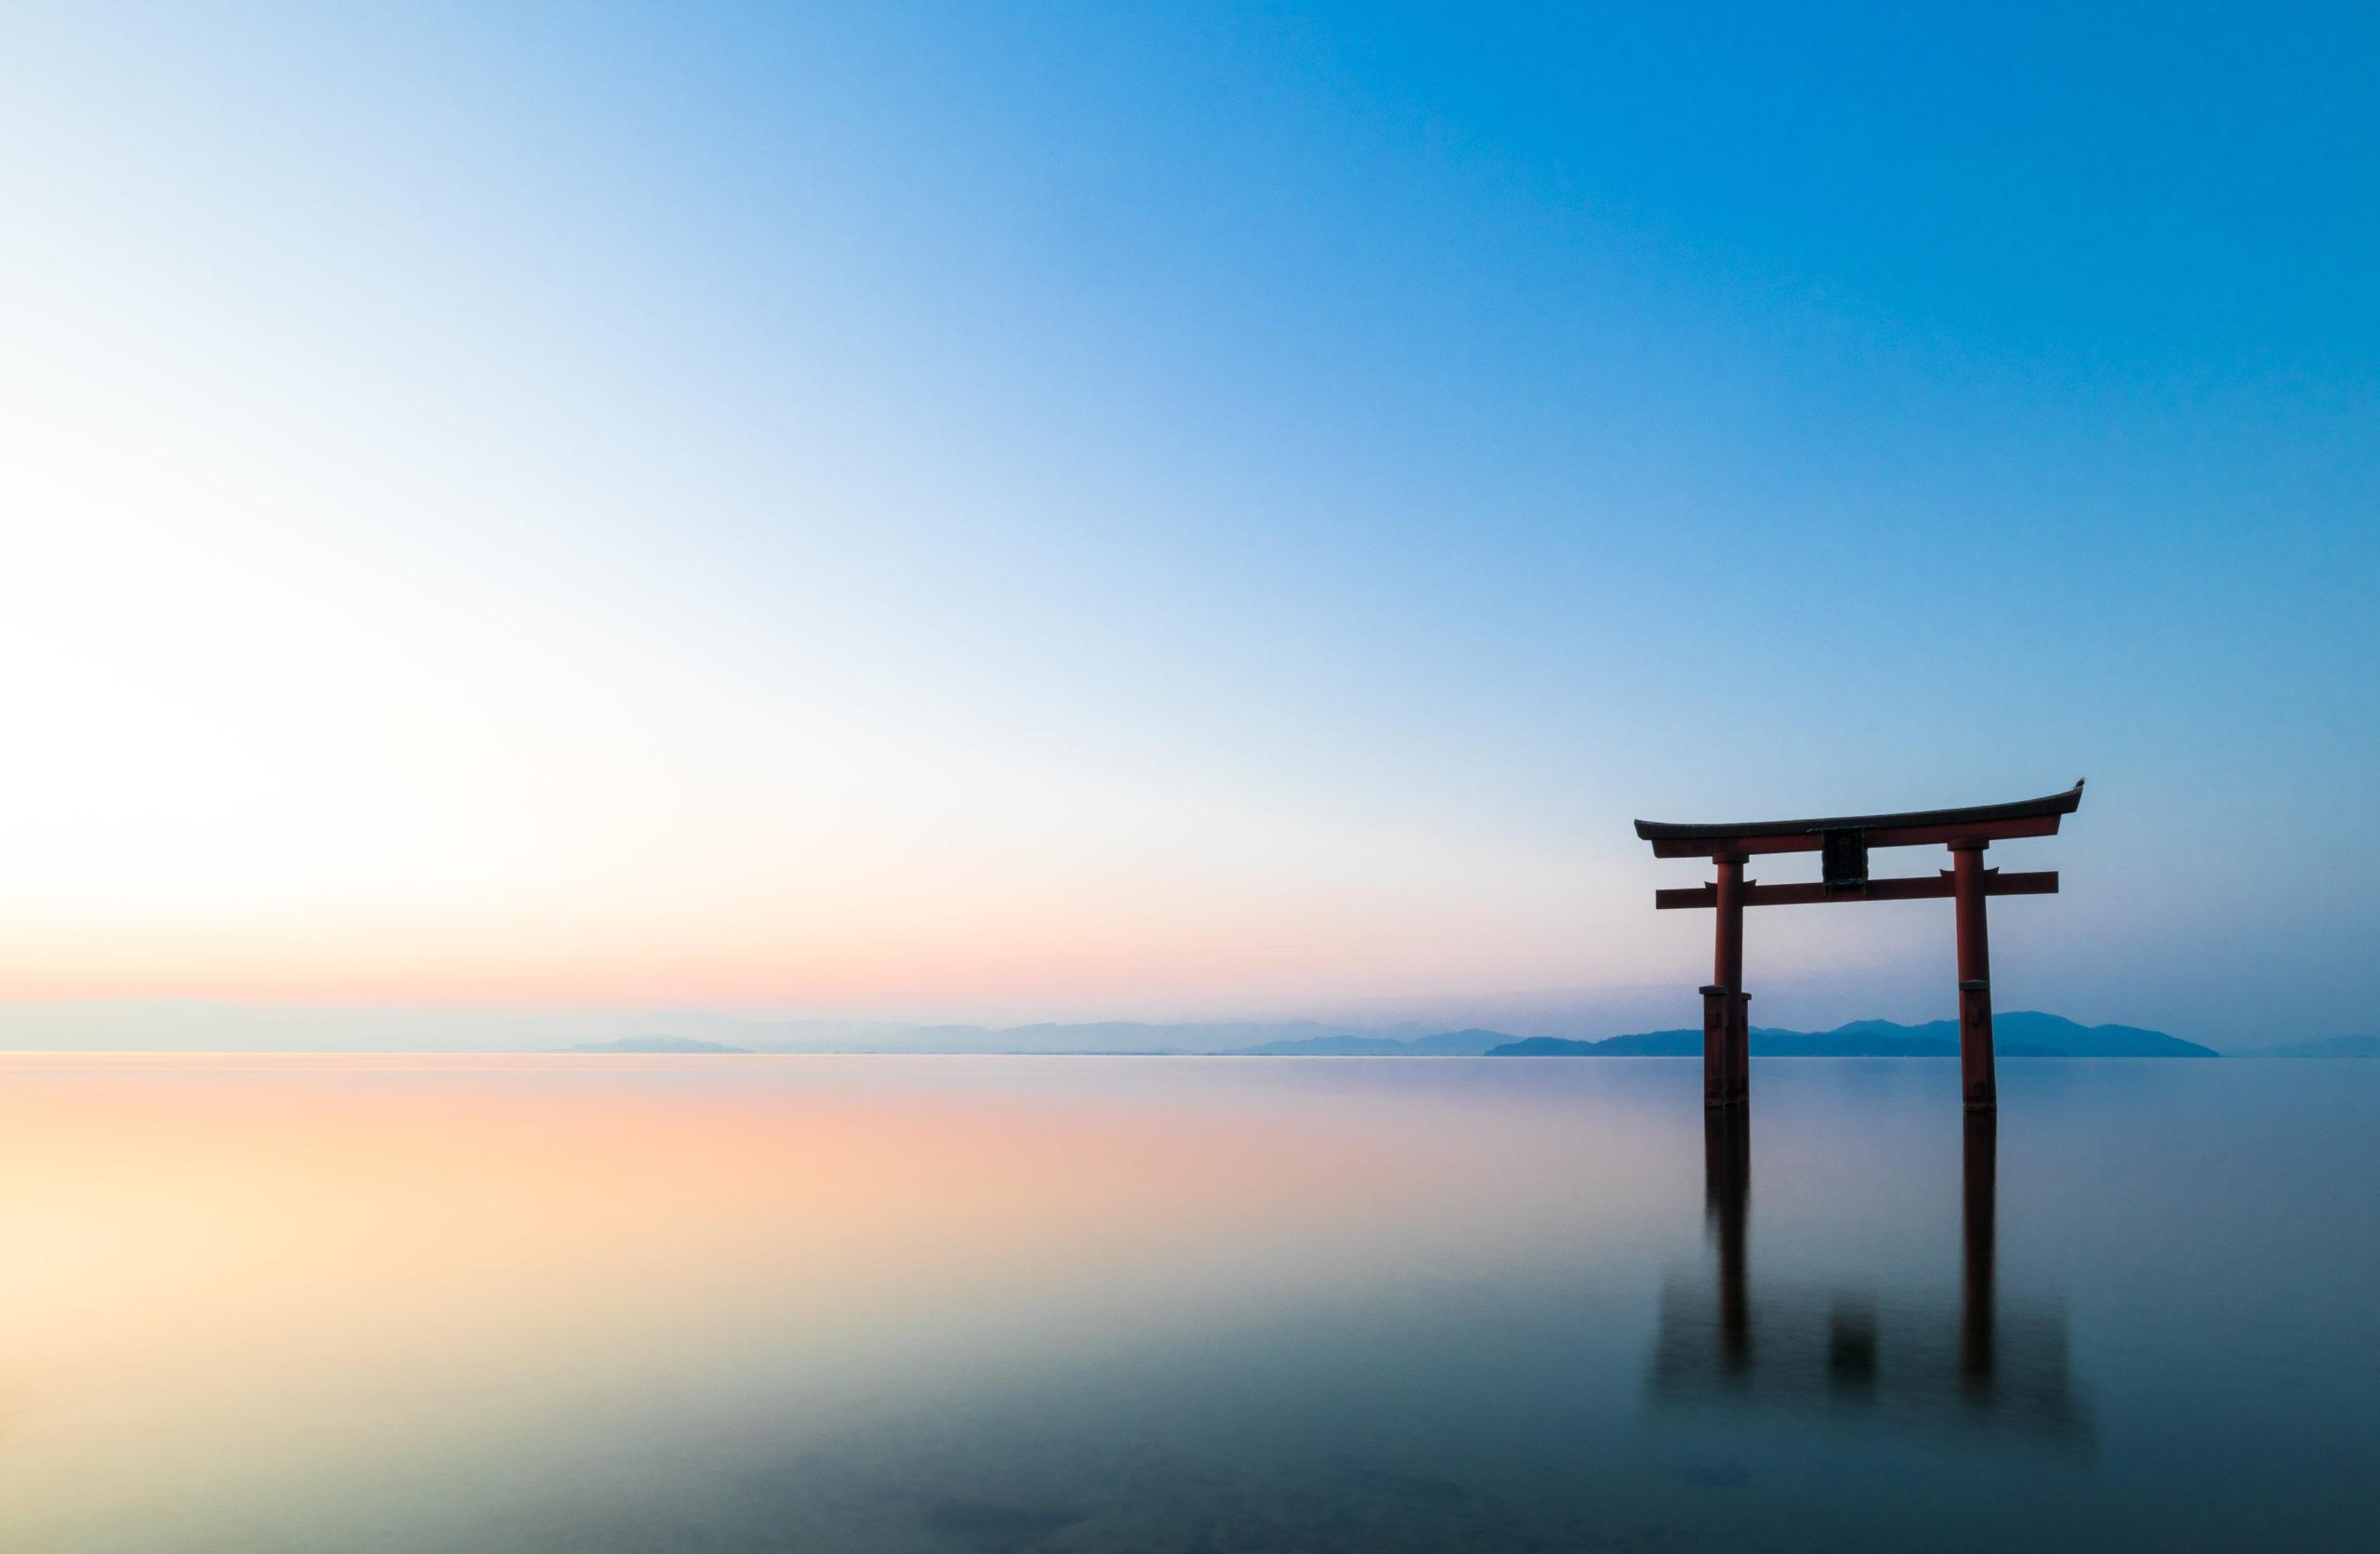 Lake Biwa Shirahige Shrine Torii